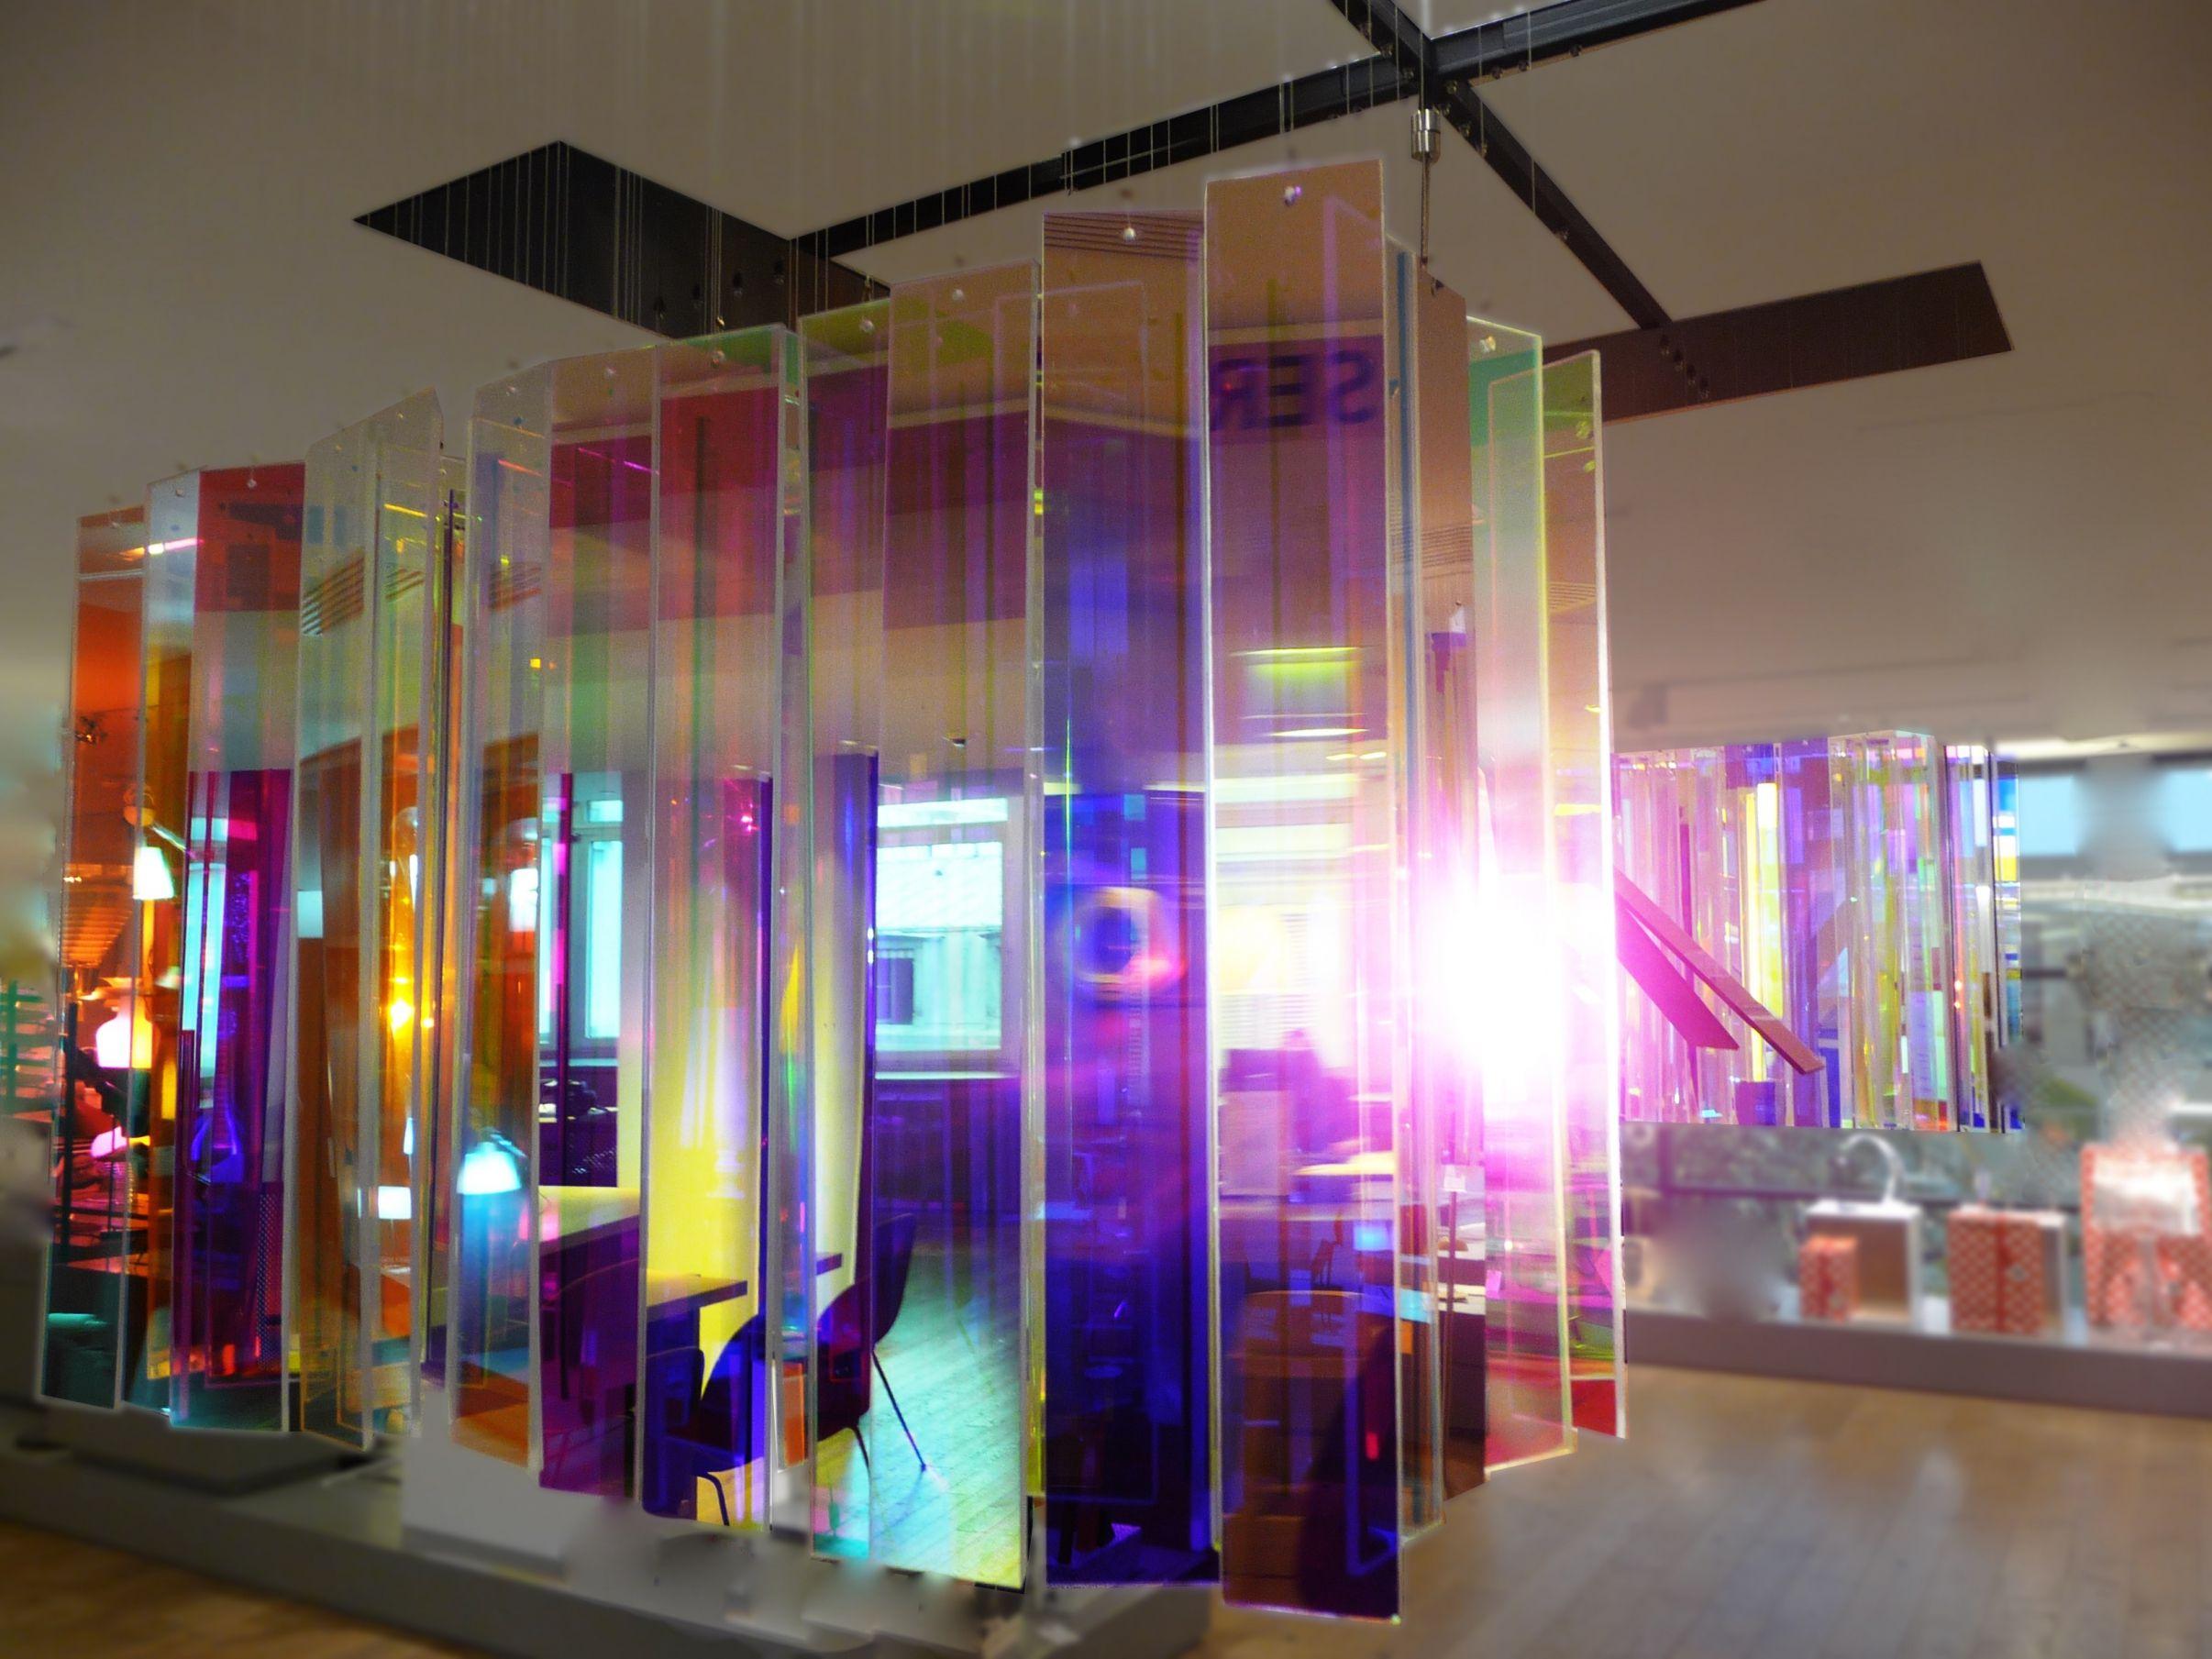 etienne rey lame oeuvre d 39 art en vente artsper oeuvre d 39 art art en ligne et contemporain